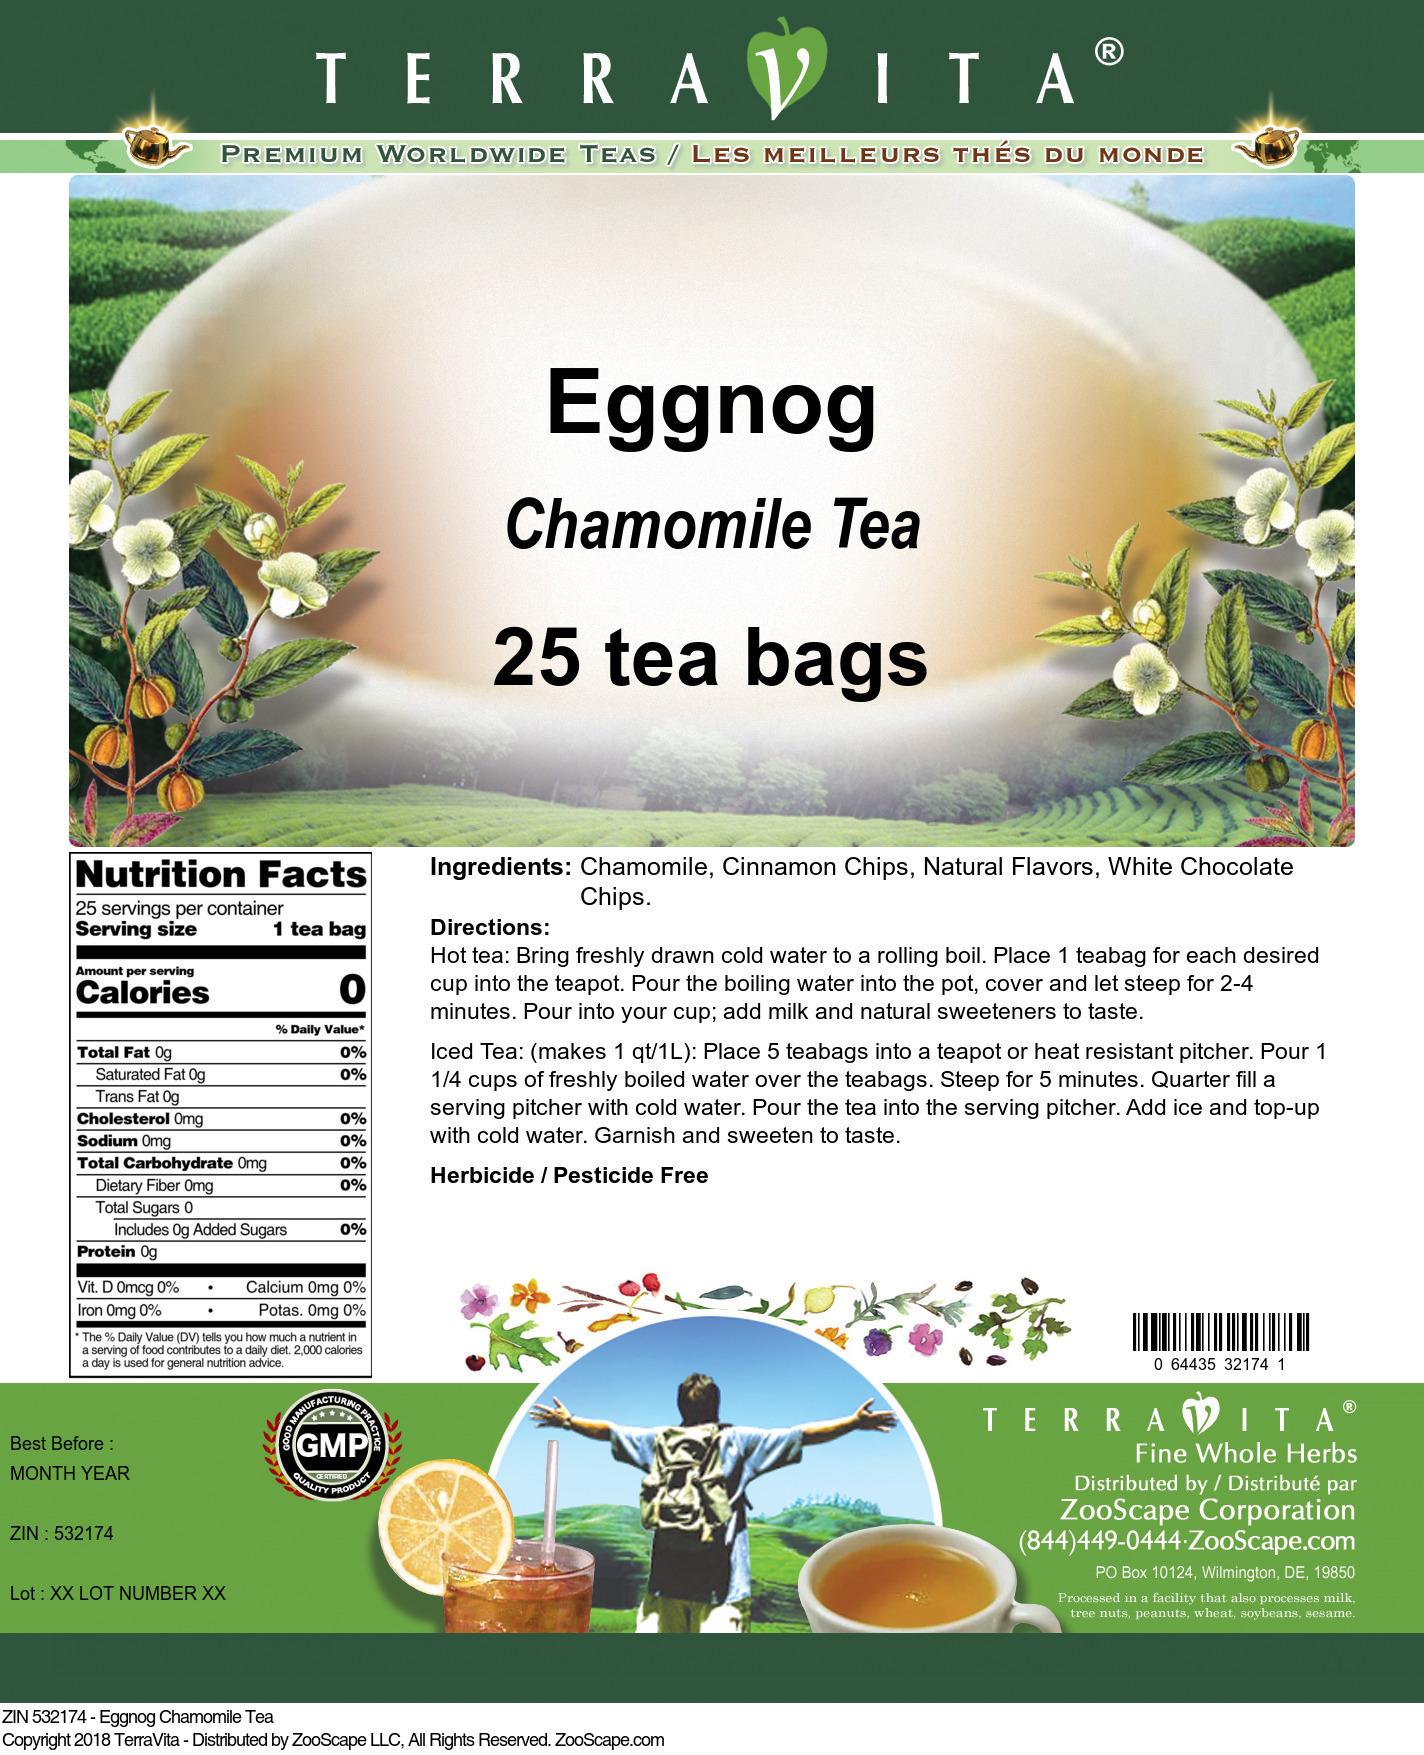 Eggnog Chamomile Tea